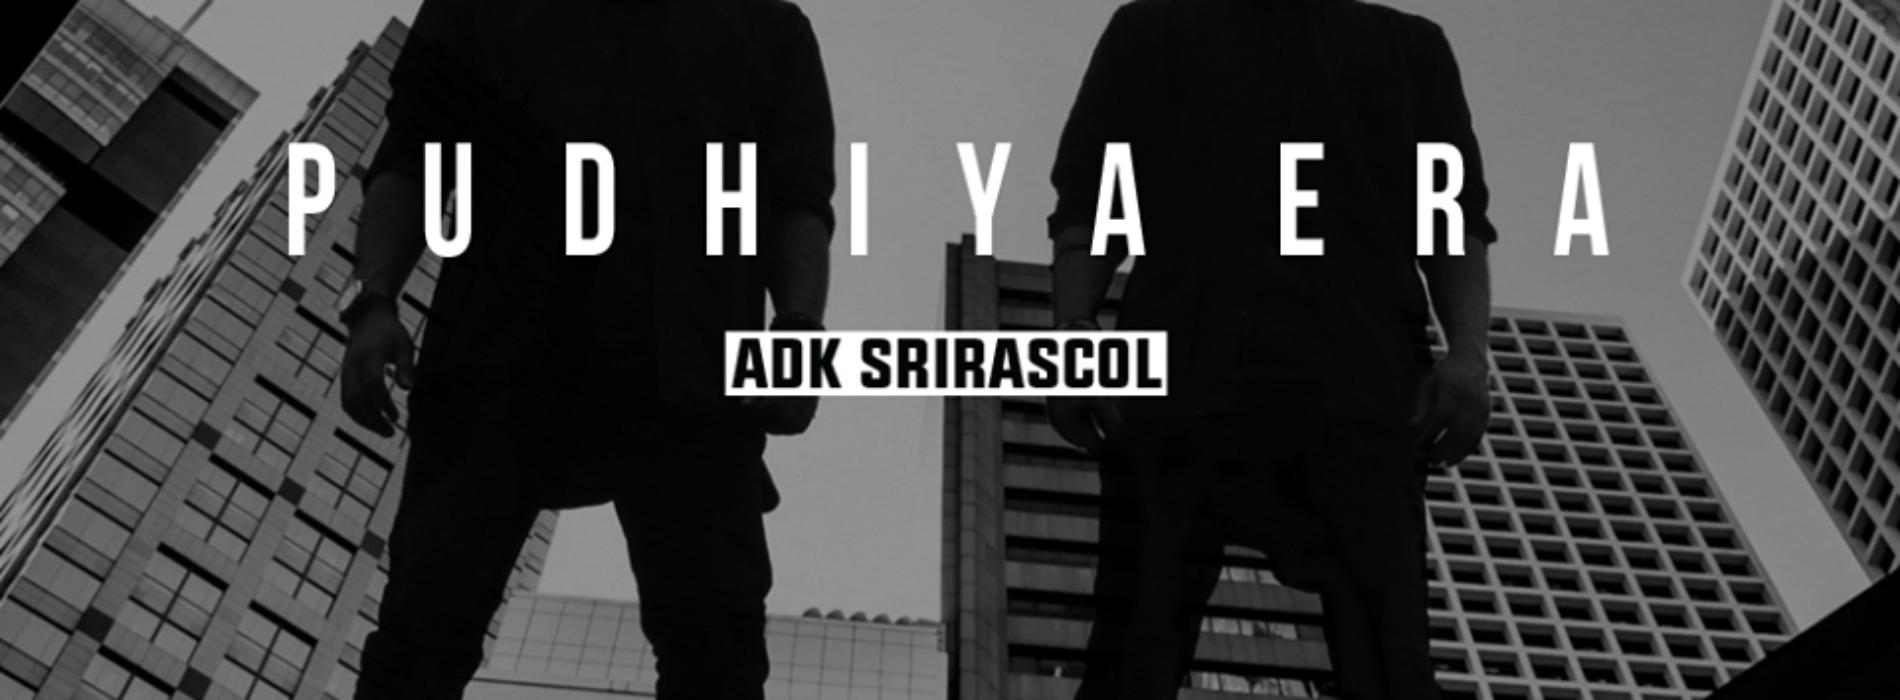 ADK SRIRASCOL – Pudhiya Era (Official Music Video)